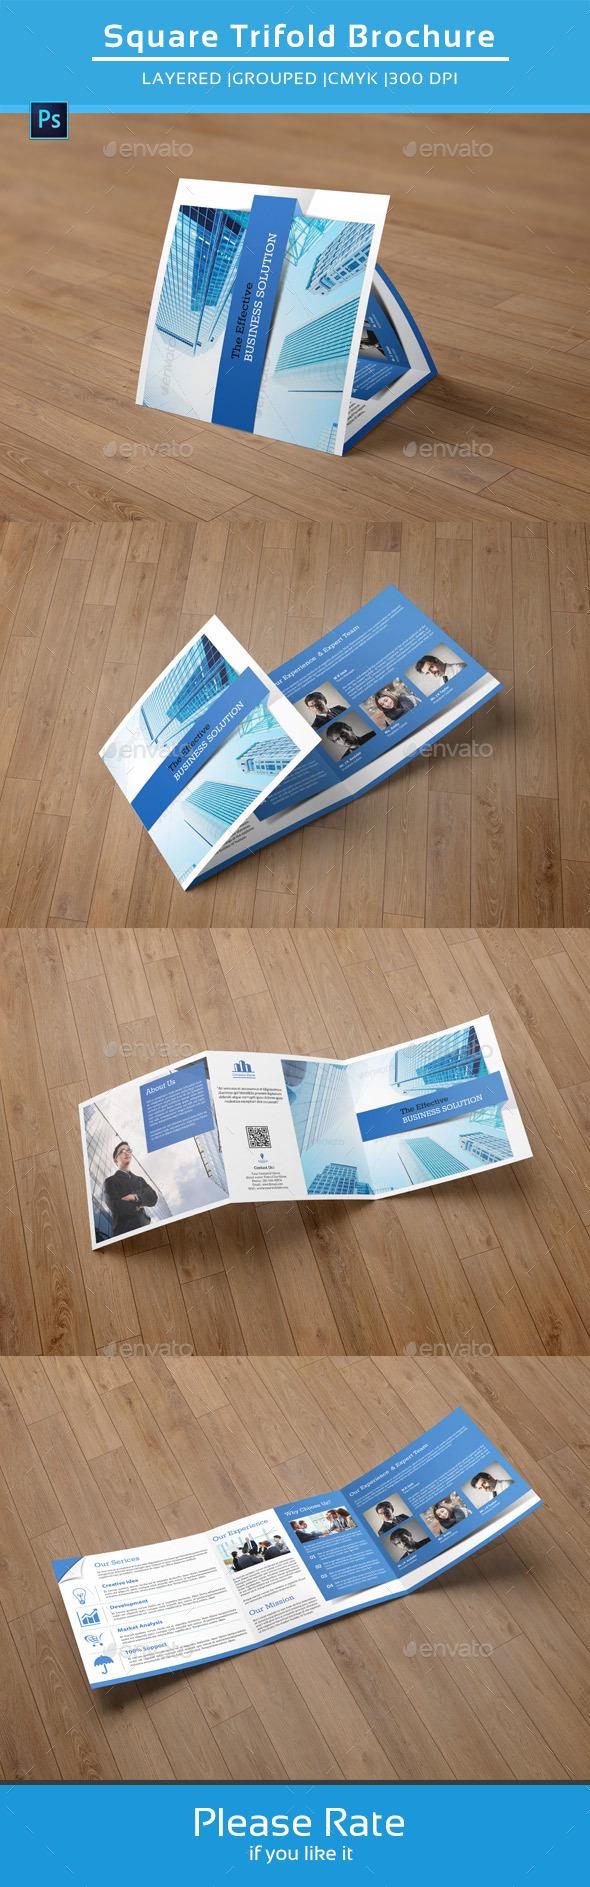 GraphicRiver Square Trifold Business Brochure-V37 8906927